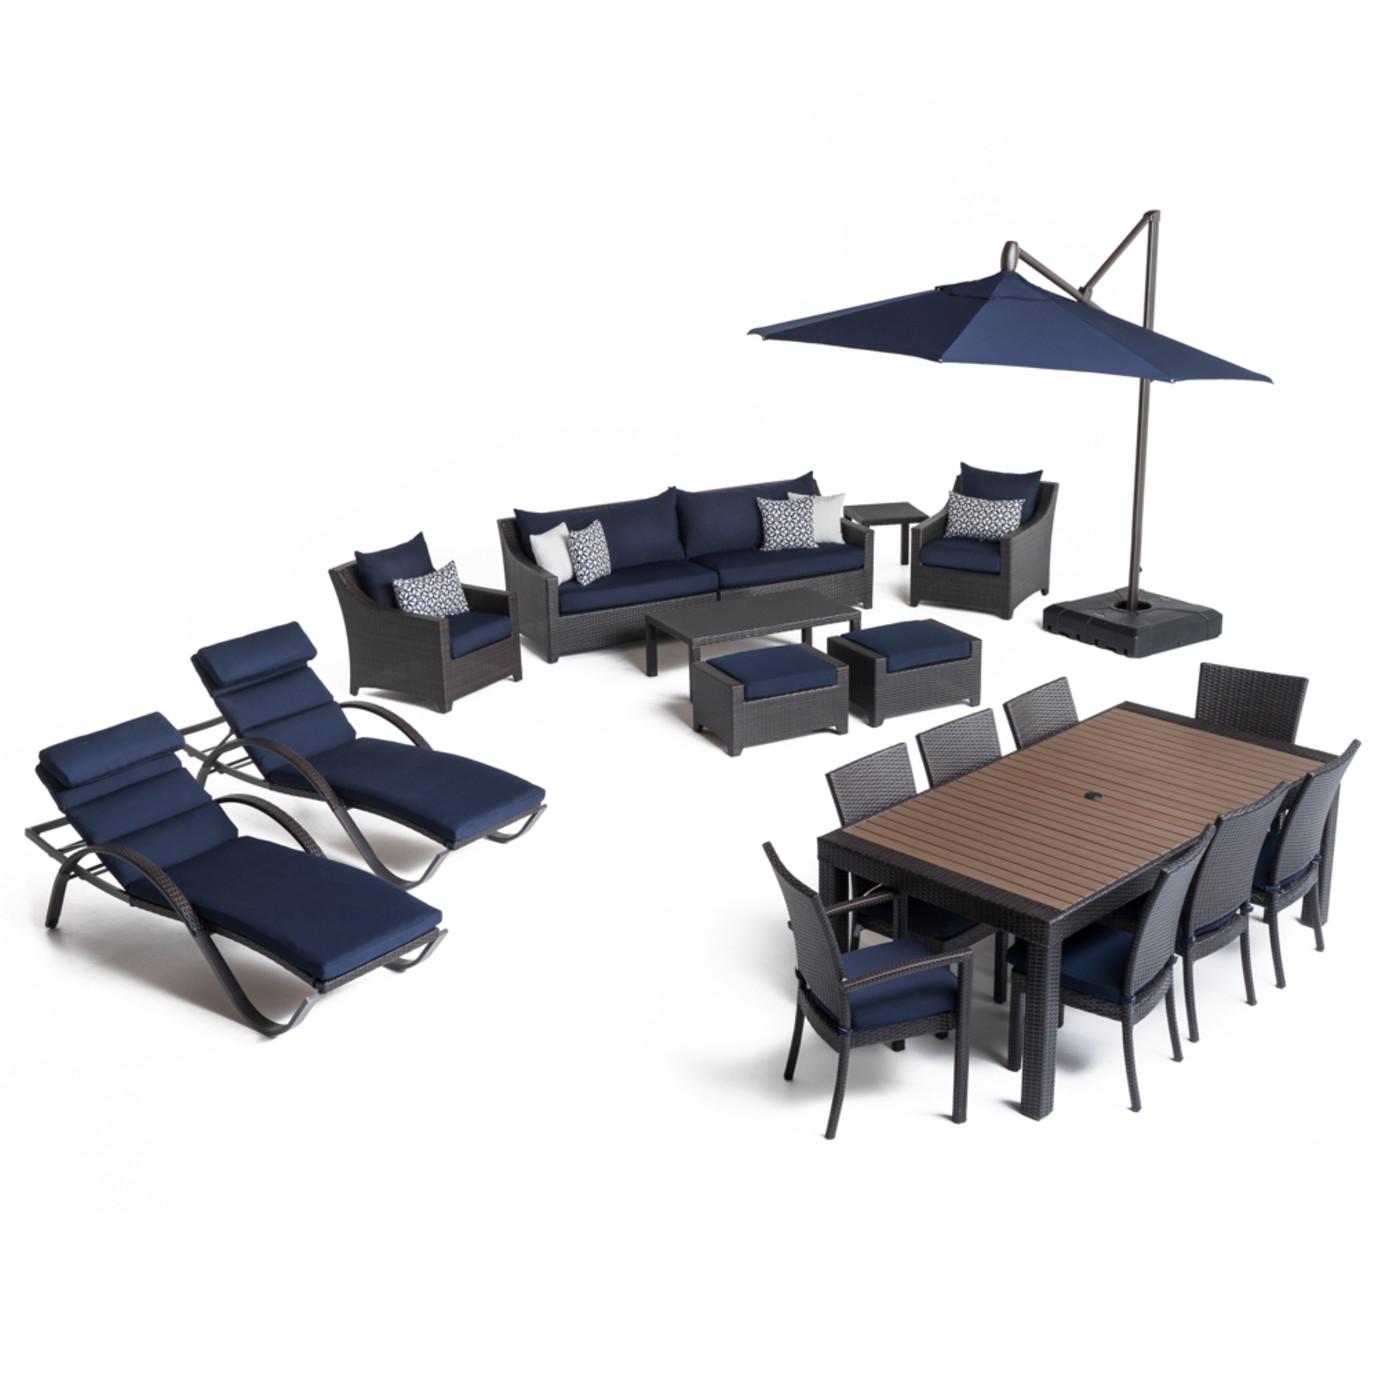 Deco™ 20pc Outdoor Estate Set - Navy Blue